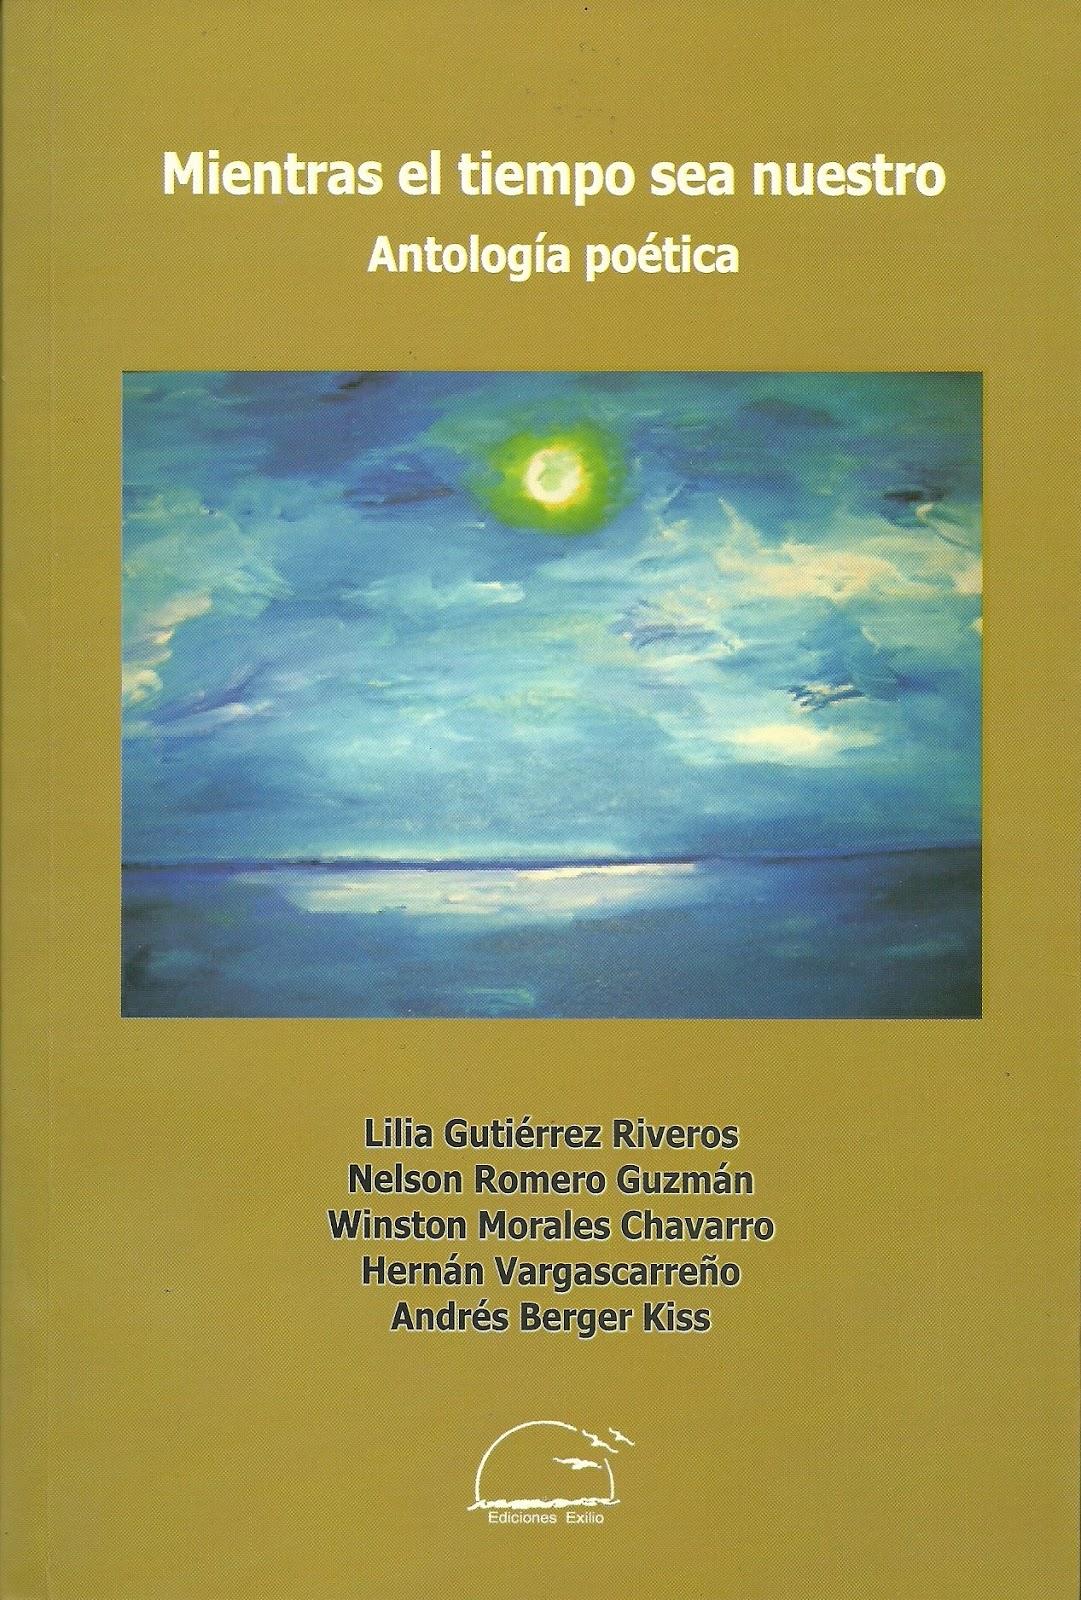 La odisea del quijote formas del tiempo y la memoria for Blanca lilia romero cenipalma